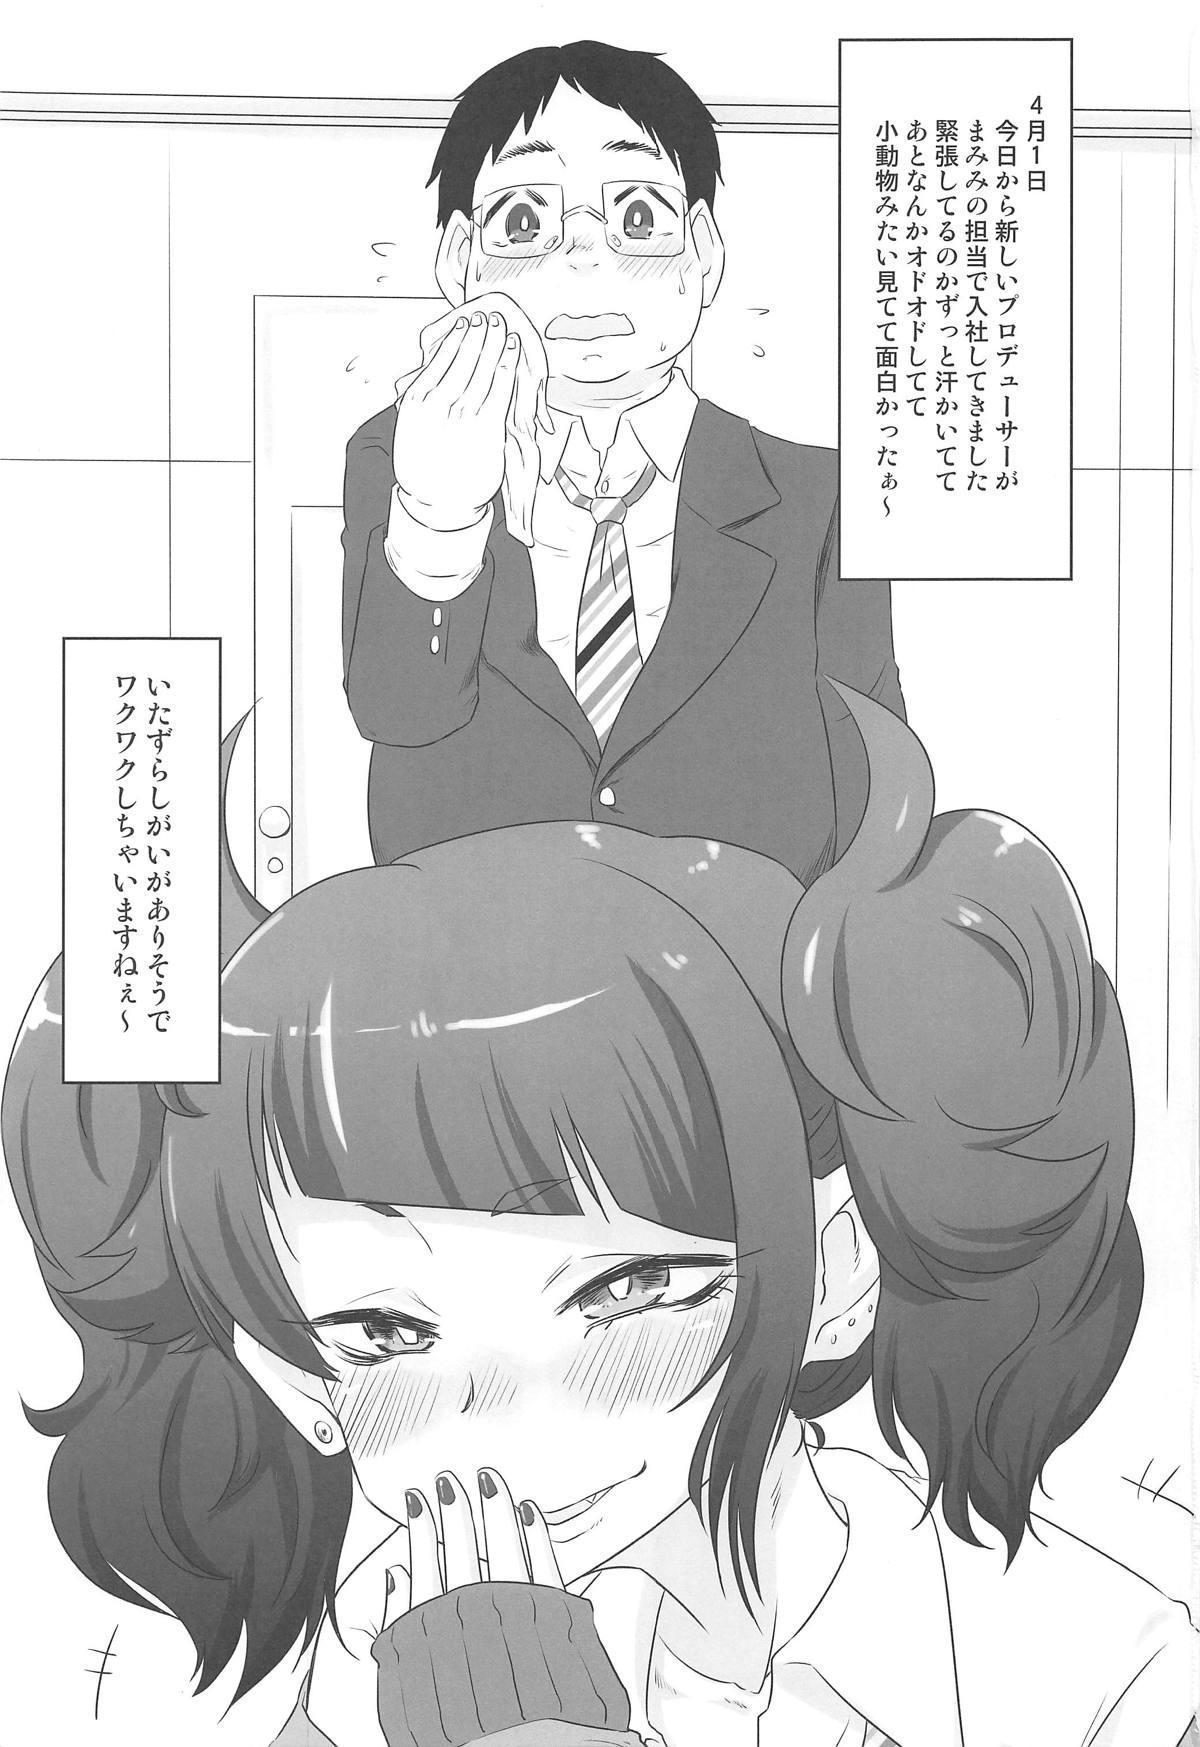 Mamimi no Itazura Nikki 1